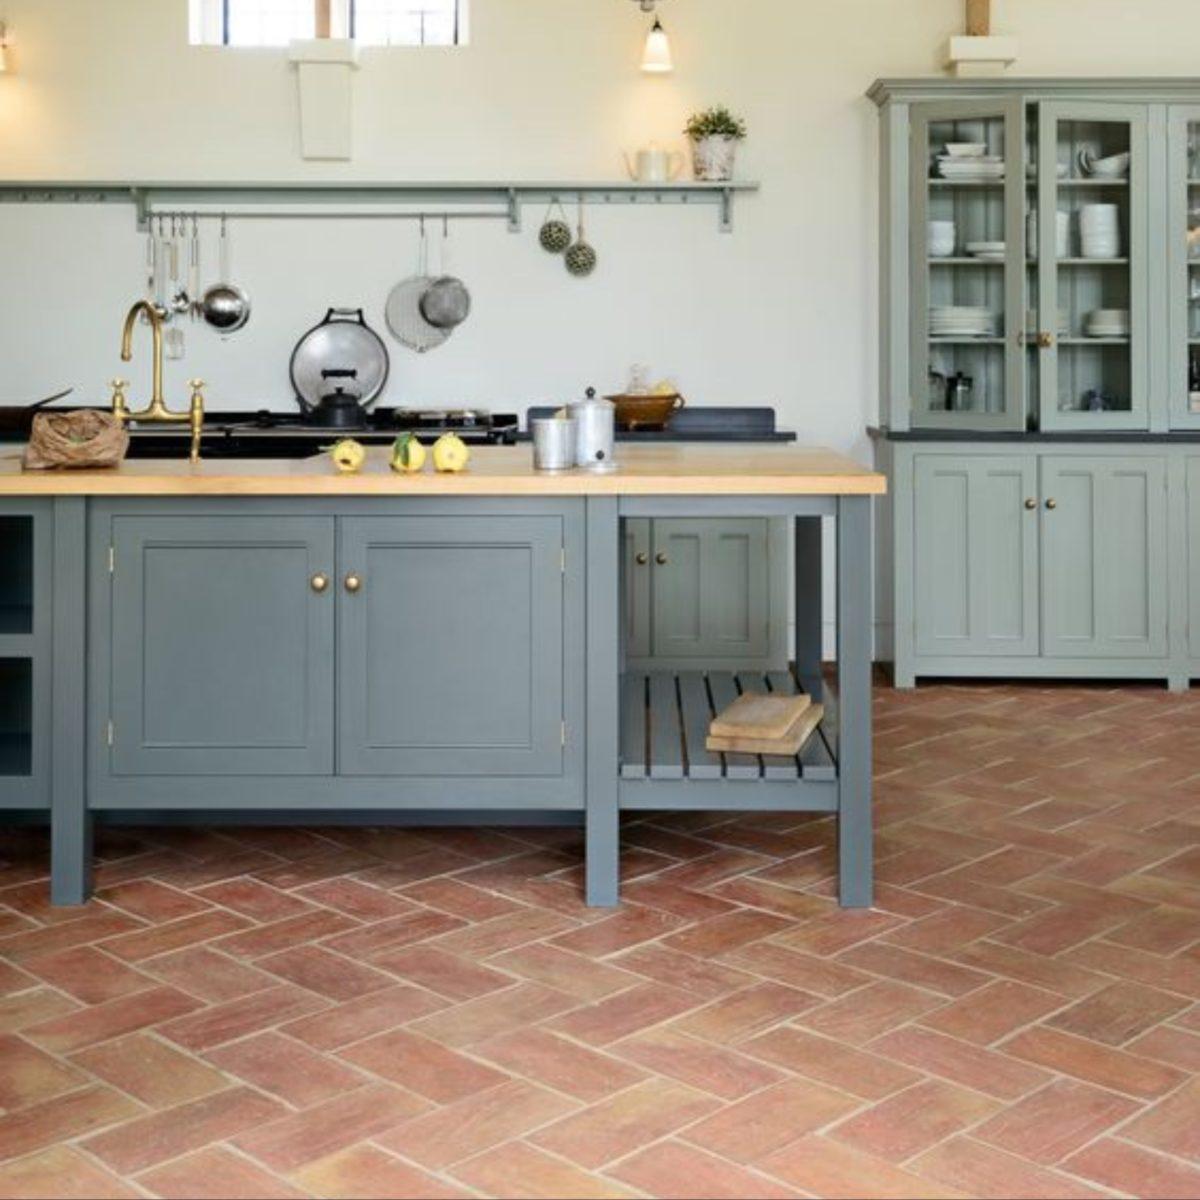 cucina-color-aragosta-piastrelle-pavimento